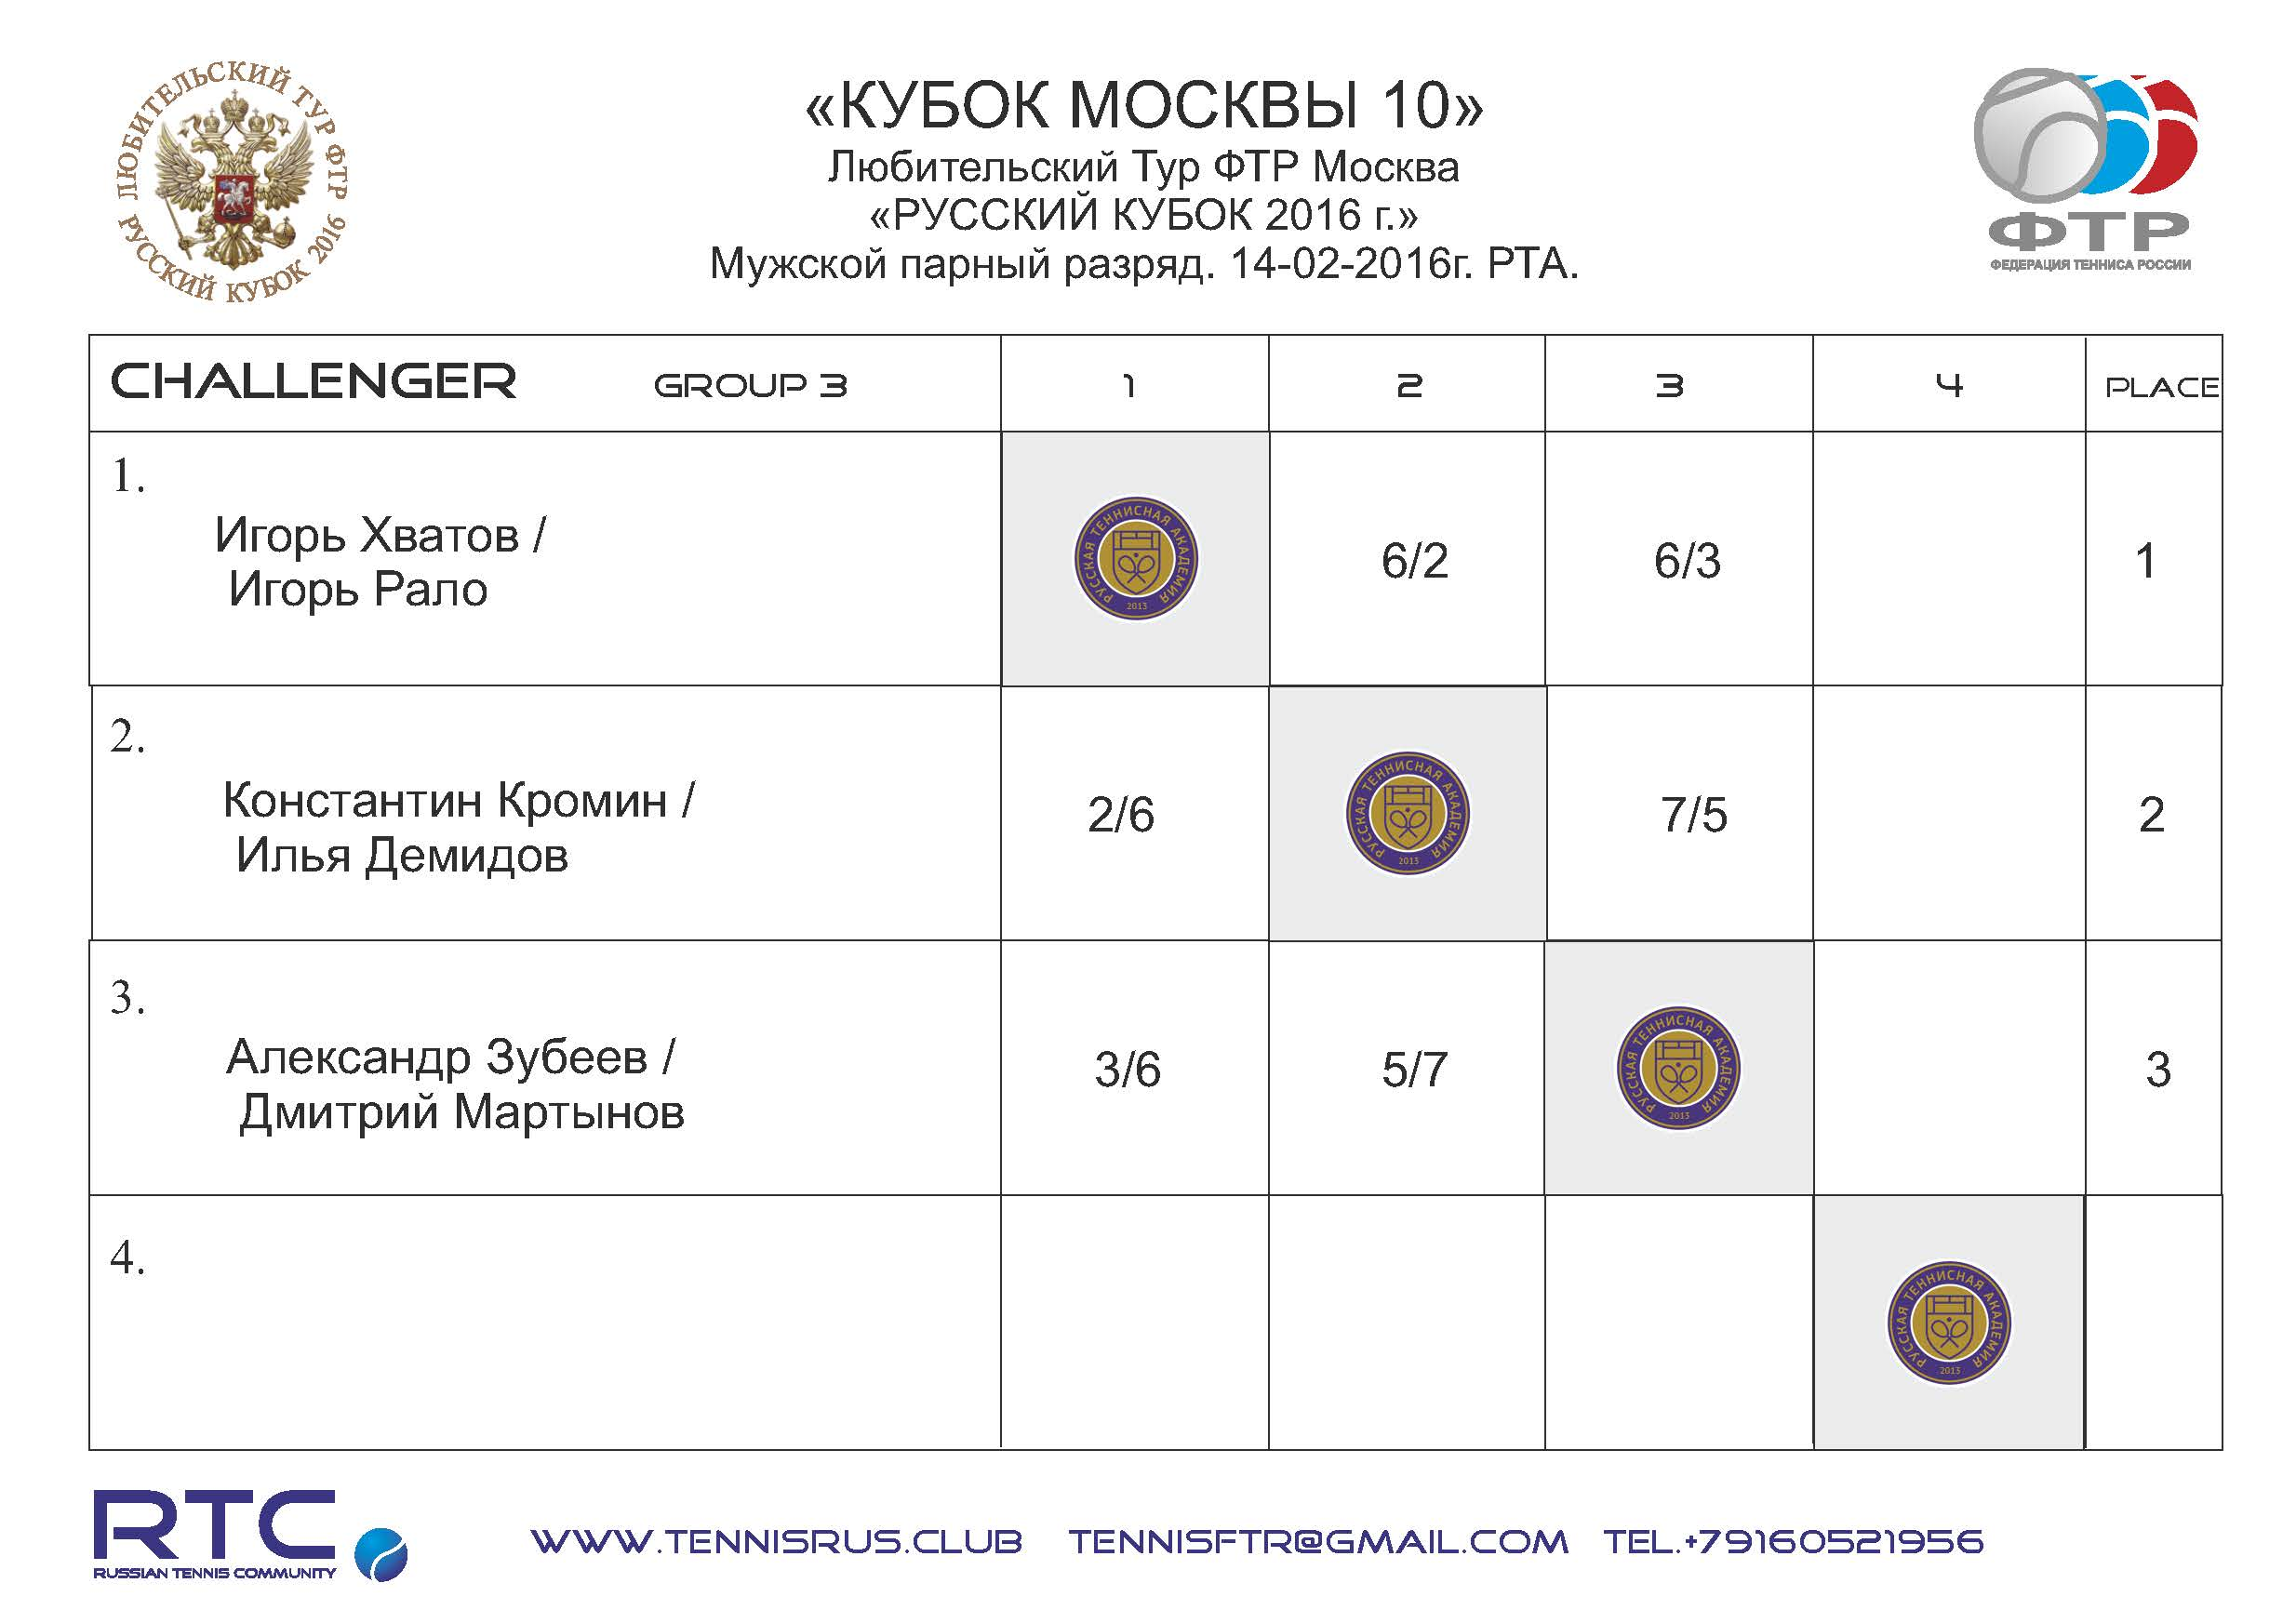 MC 10 2016 mens pairs Challenger GR 3